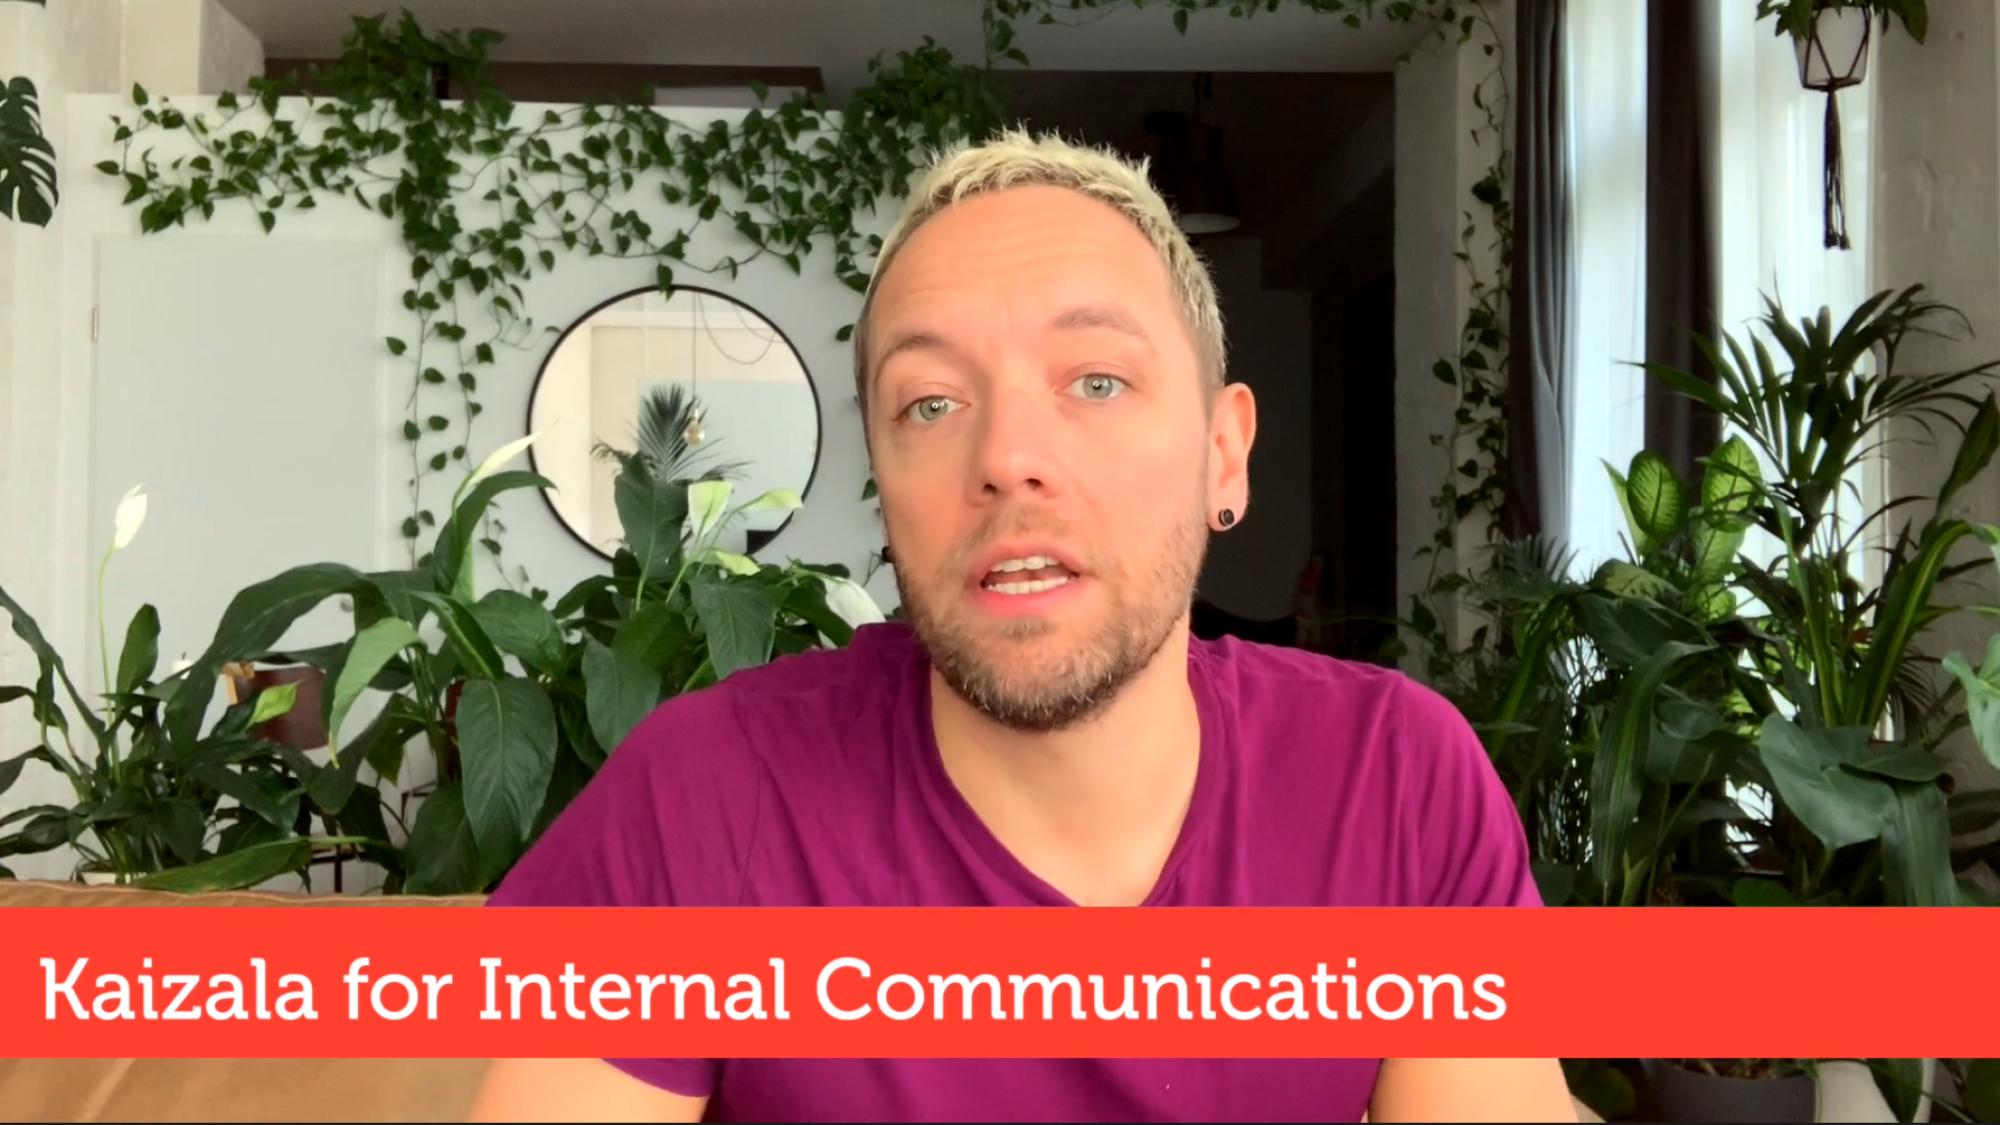 Kaizala for internal communications